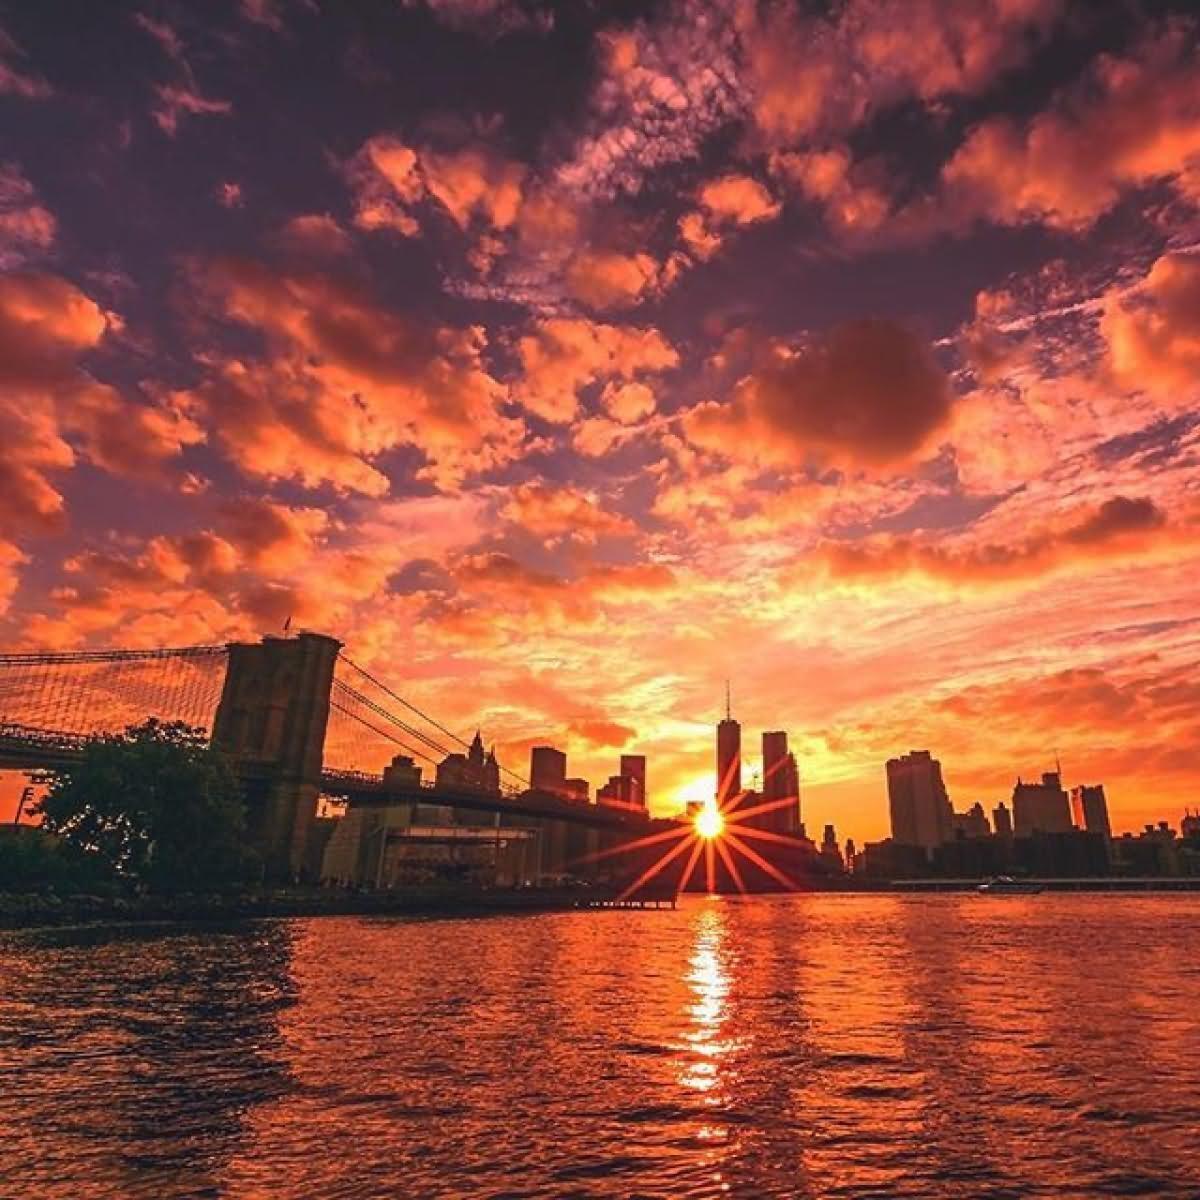 incredible sun set view - photo #42